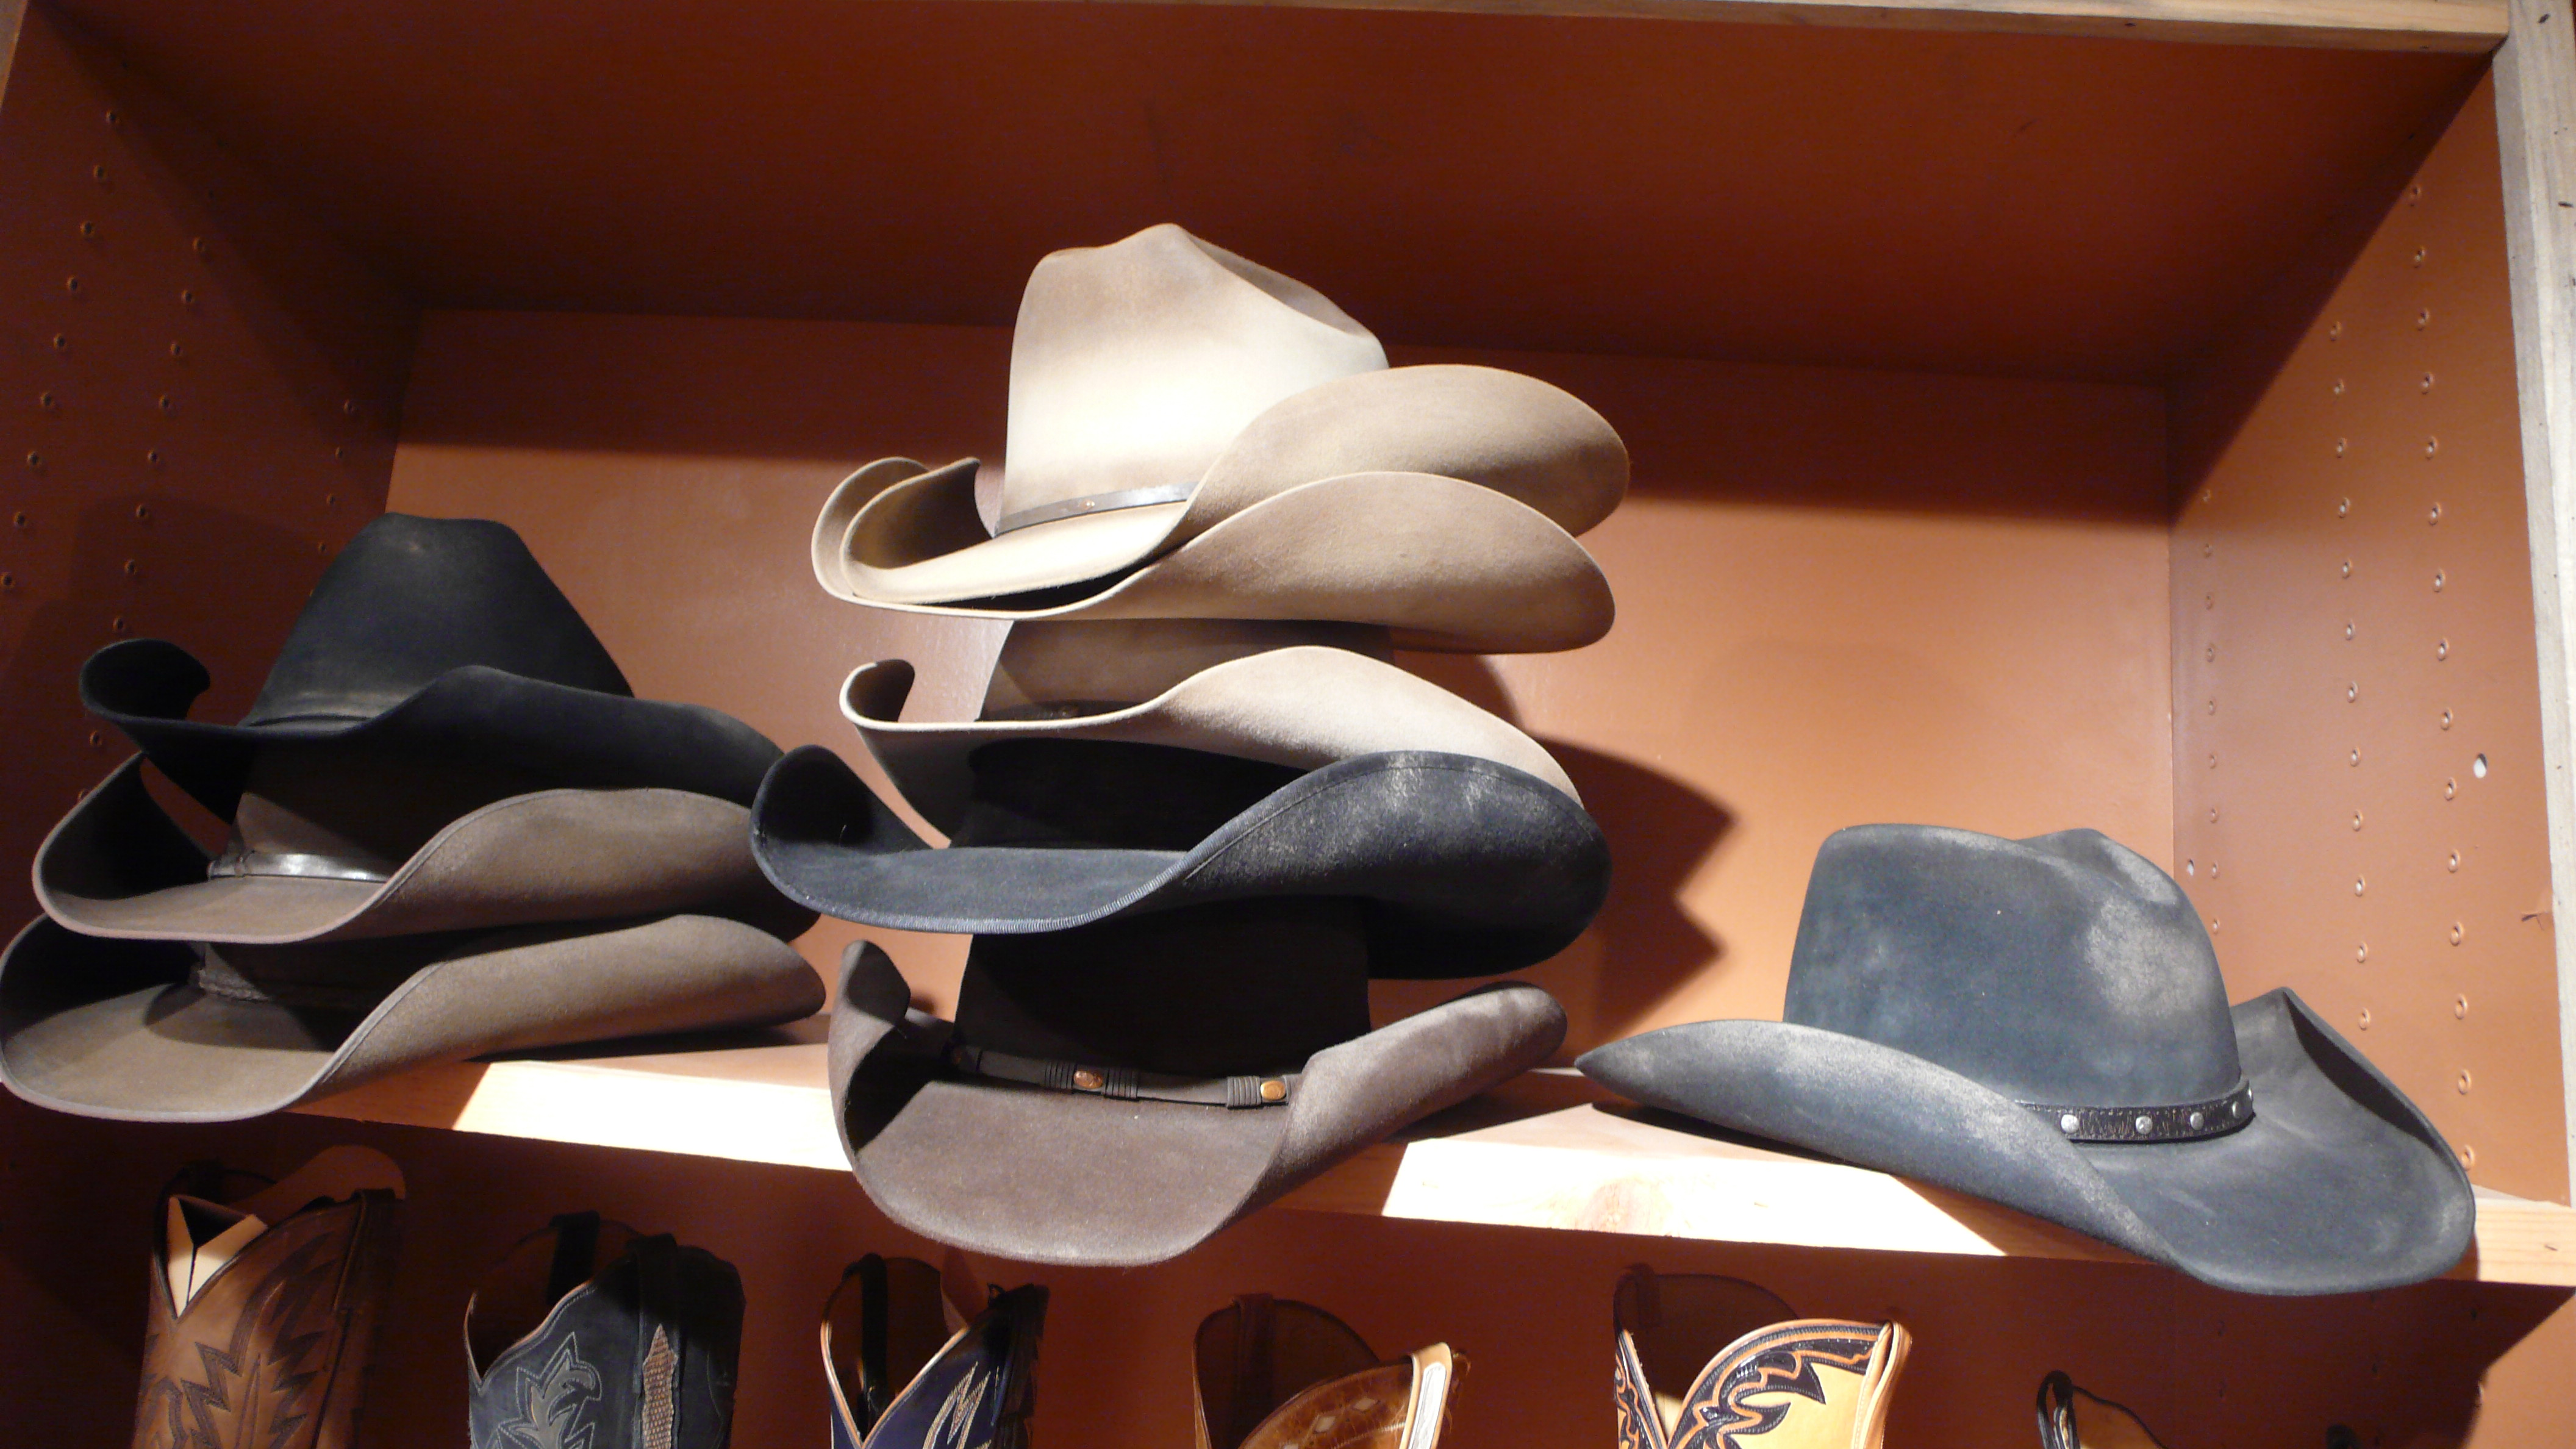 c28ba09d13f Distressed Stetson Hats at Burns Cowboy Shop